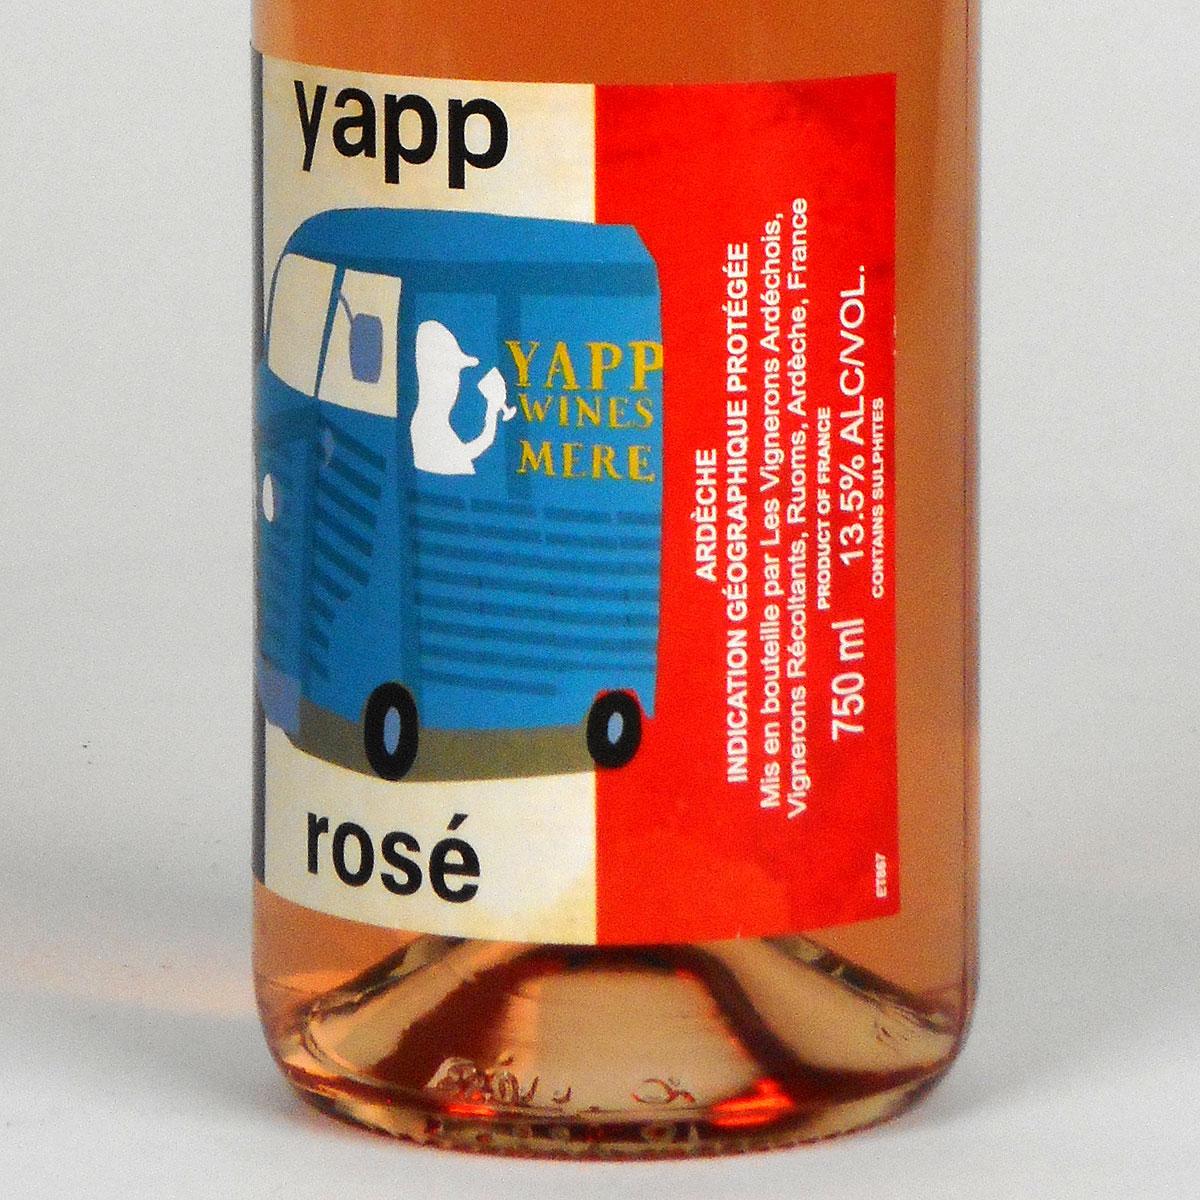 Yapp Rosé 2019 - Bottle Side Label